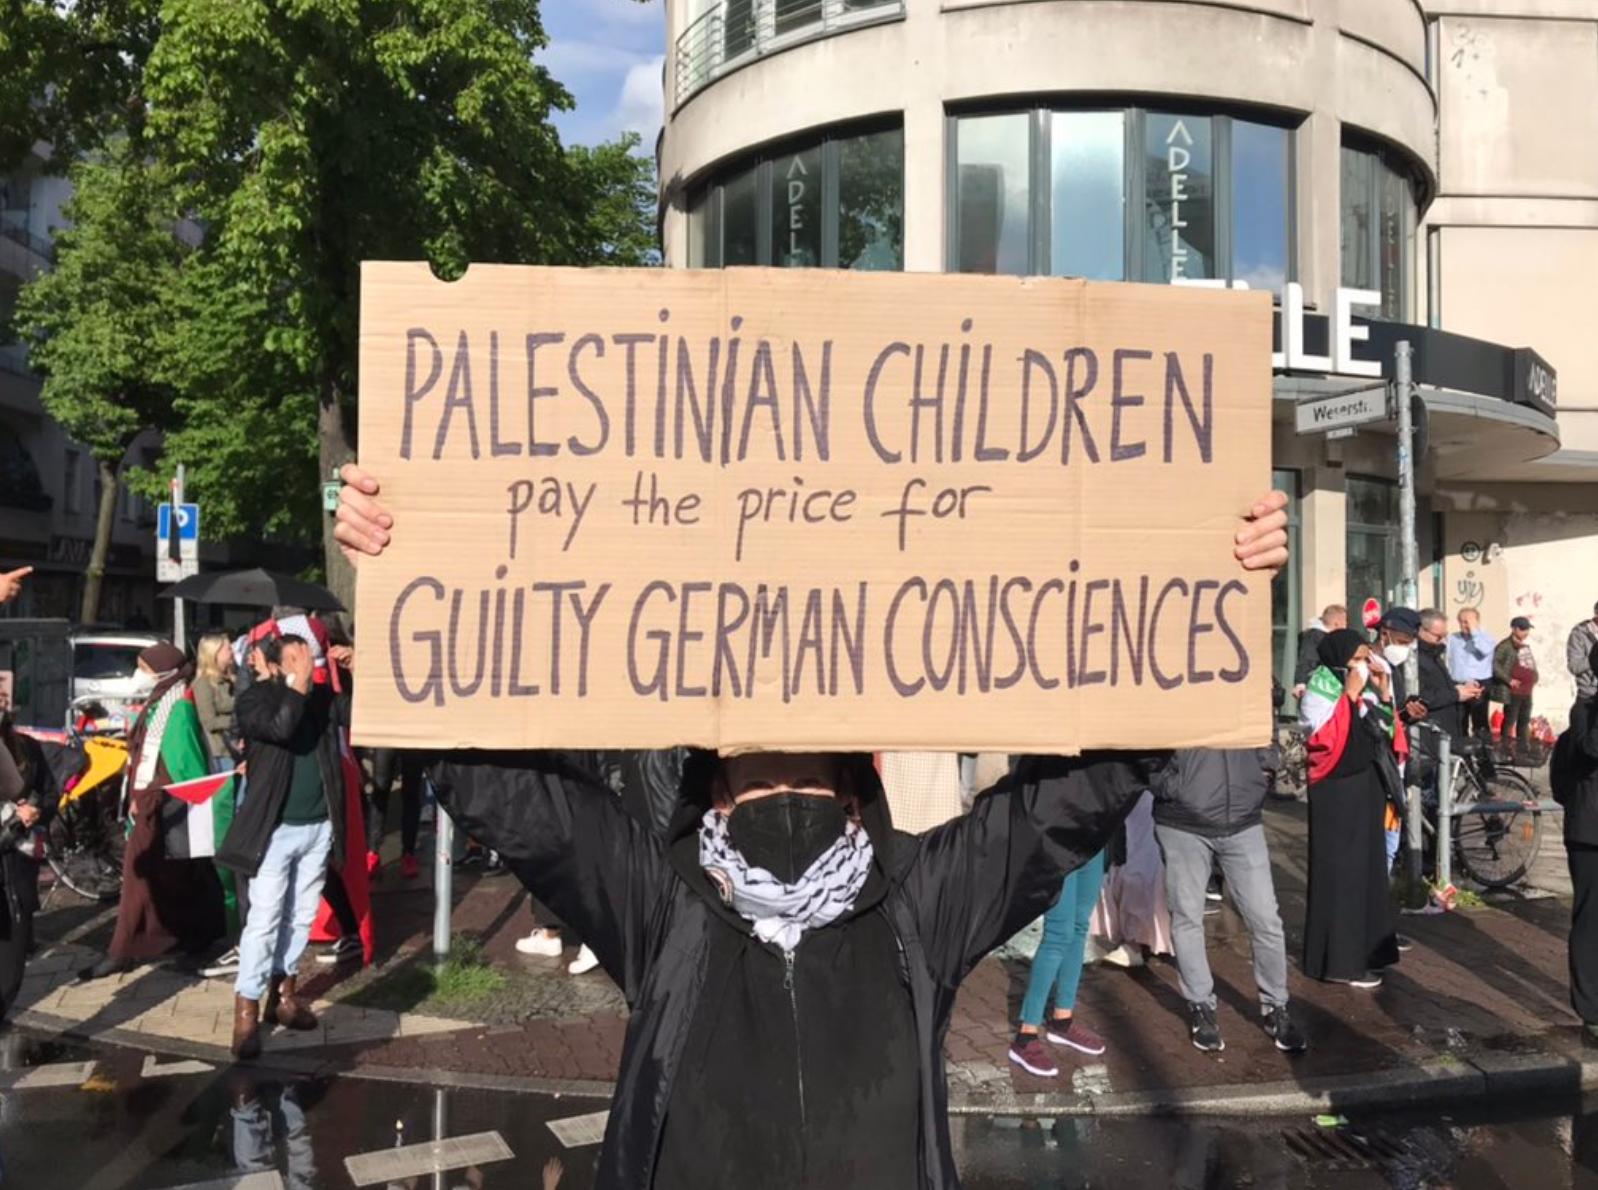 A demonstrator at Berlin's Nakba Day protest, May 15, 2021. Photo via @amroali, Twitter.